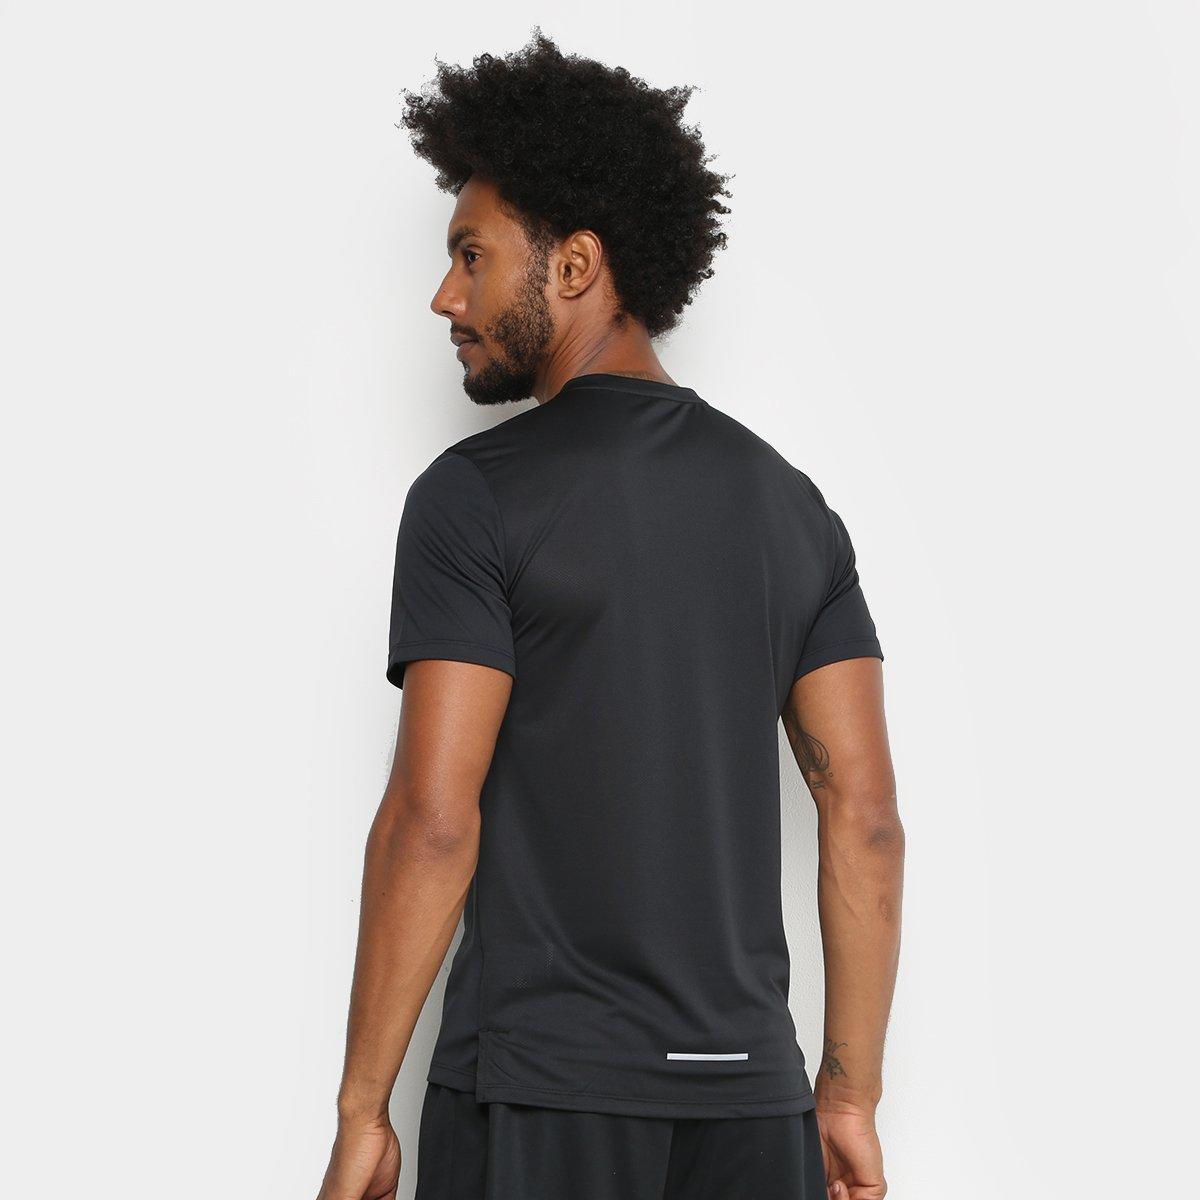 Camiseta Nike DRI-FIT Miler Masculina - Tam: P - 1